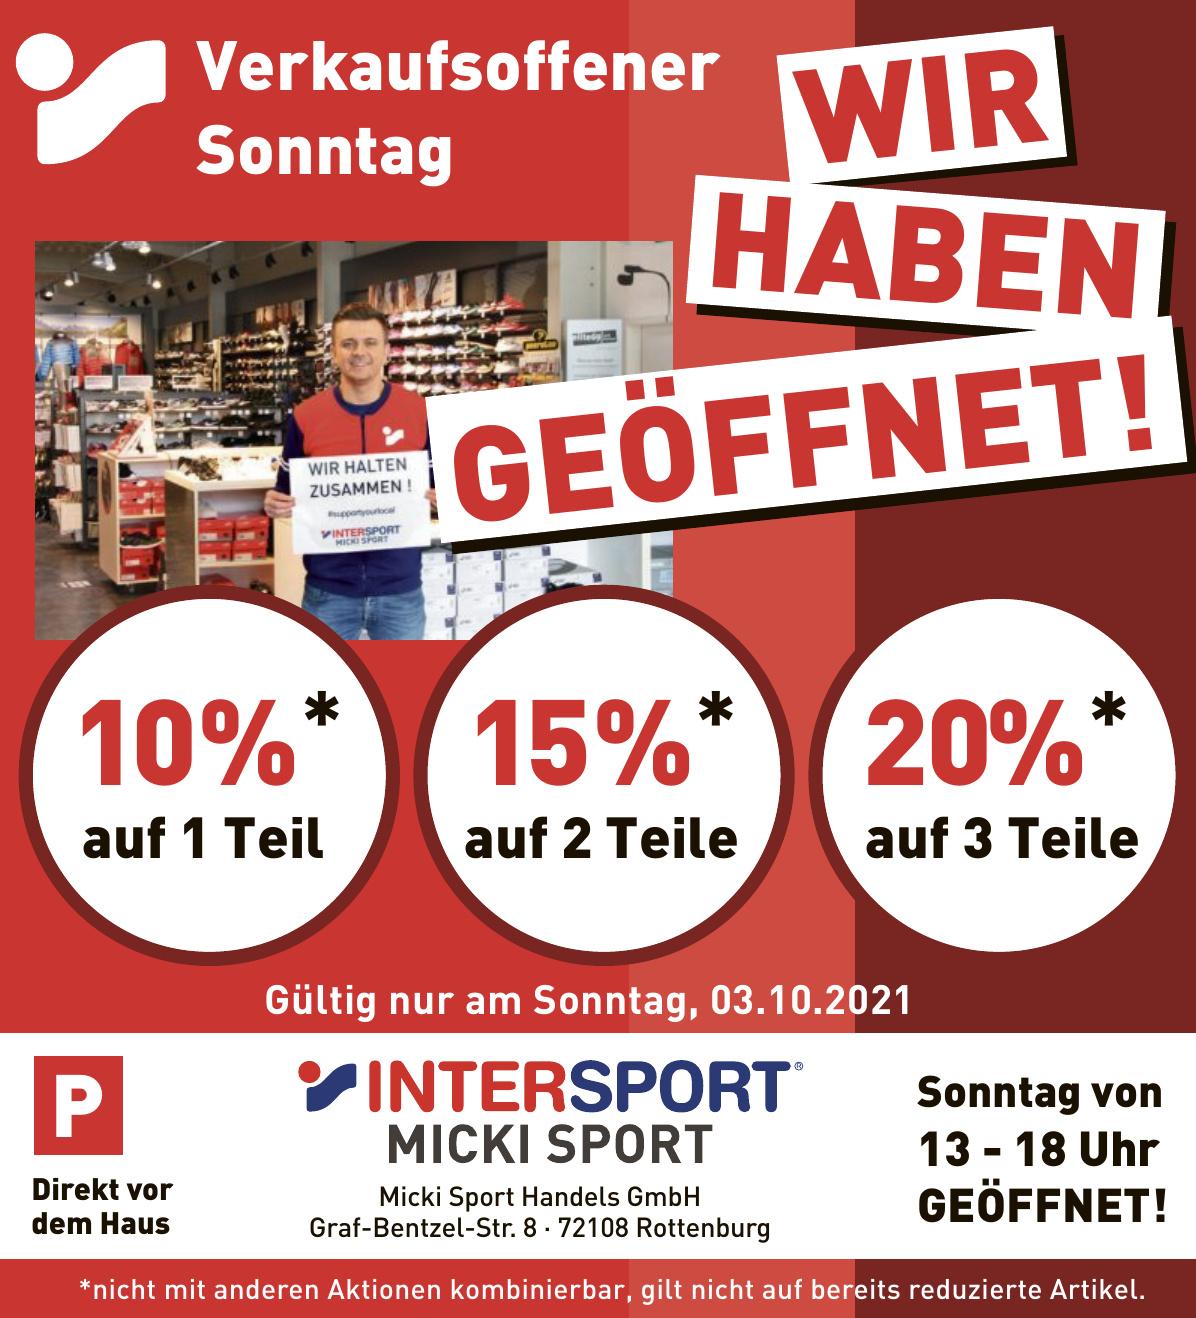 Micki Sport Handels GmbH